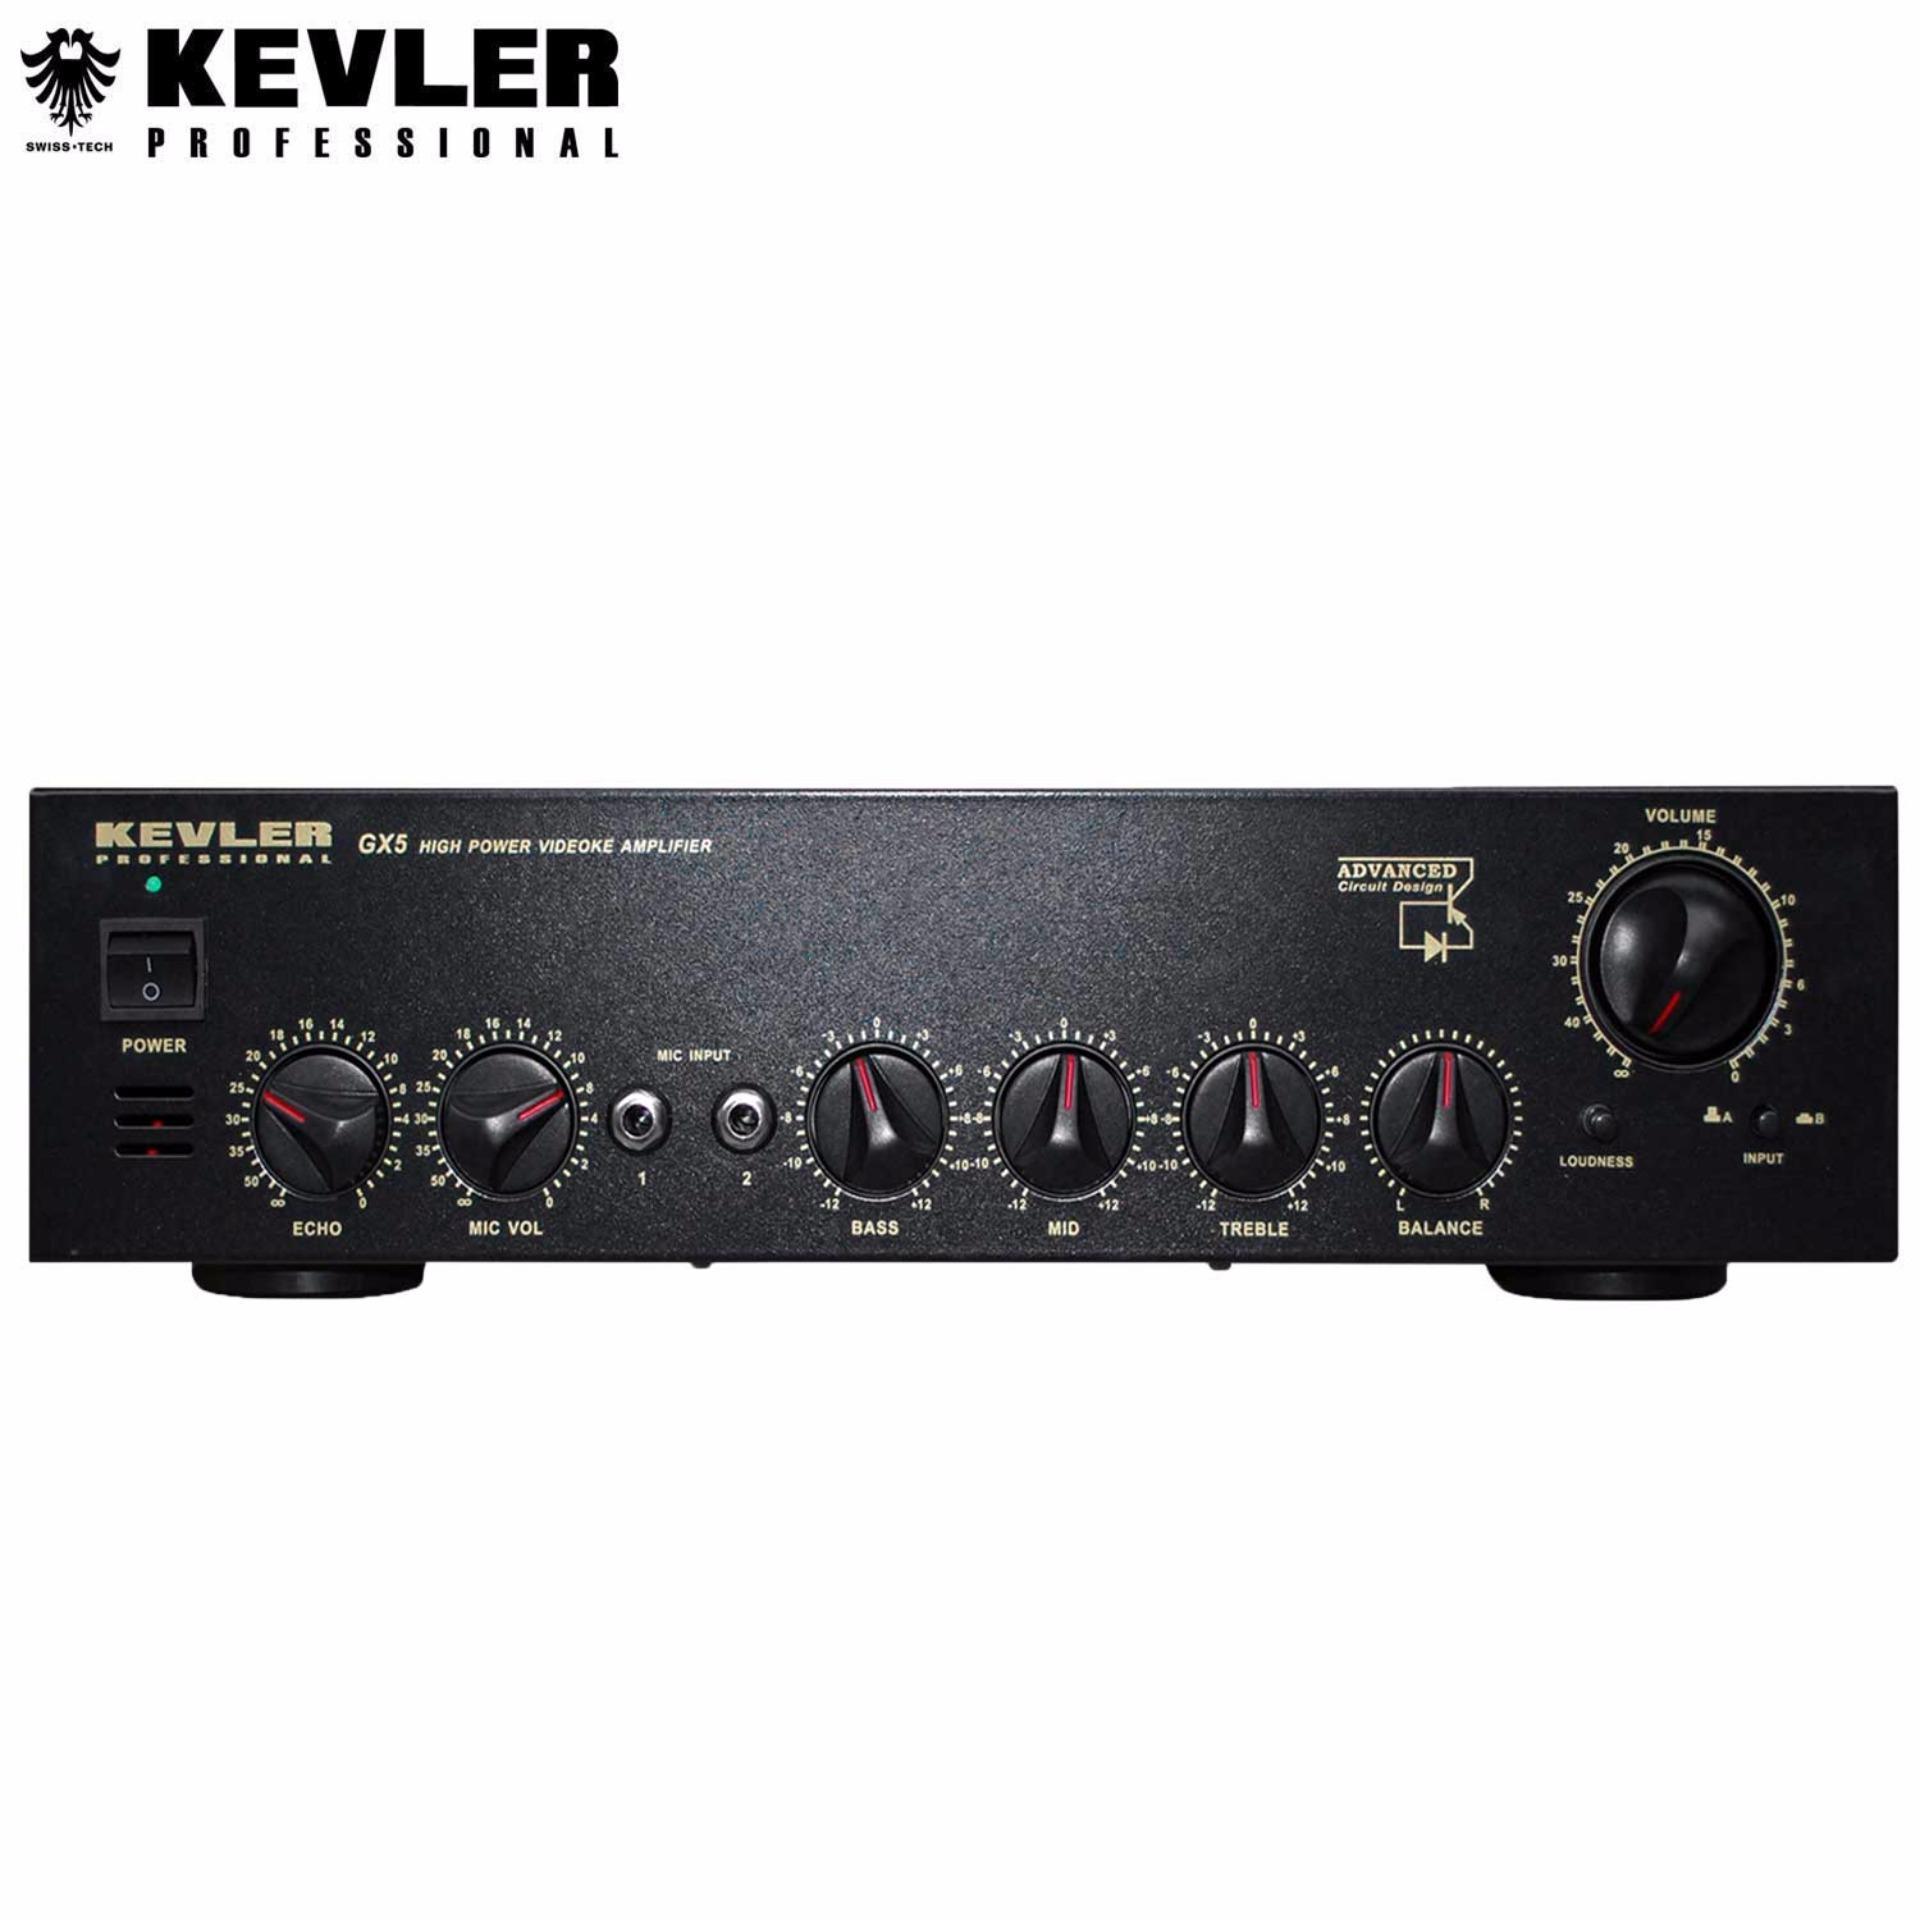 Kevler Professional Gx5 High Powered Amplifier 600w Black Audio